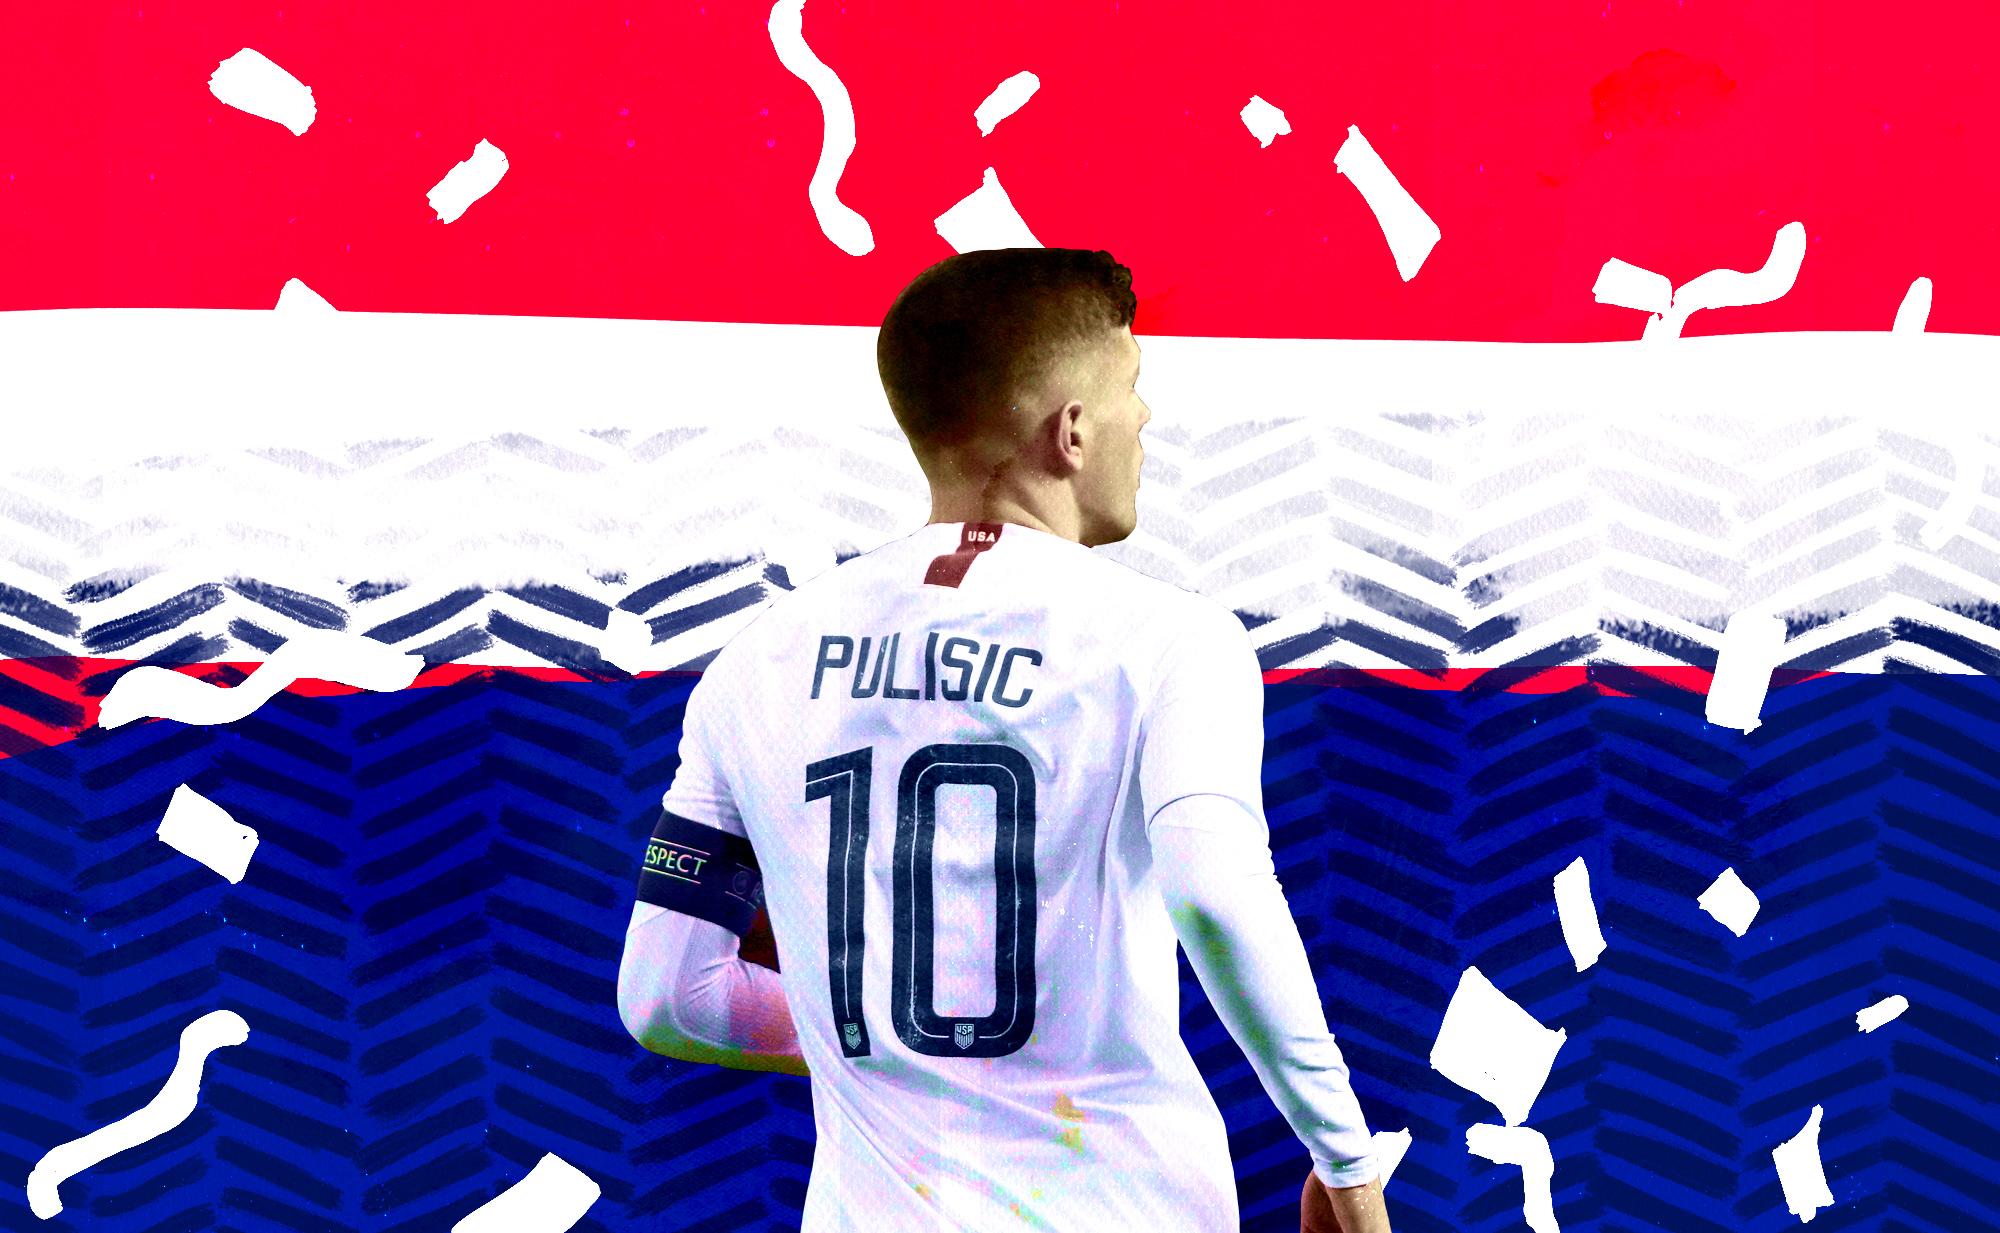 dd18ba90aa1 Christian Pulisic's future in U.S. soccer in 3 case studies ...